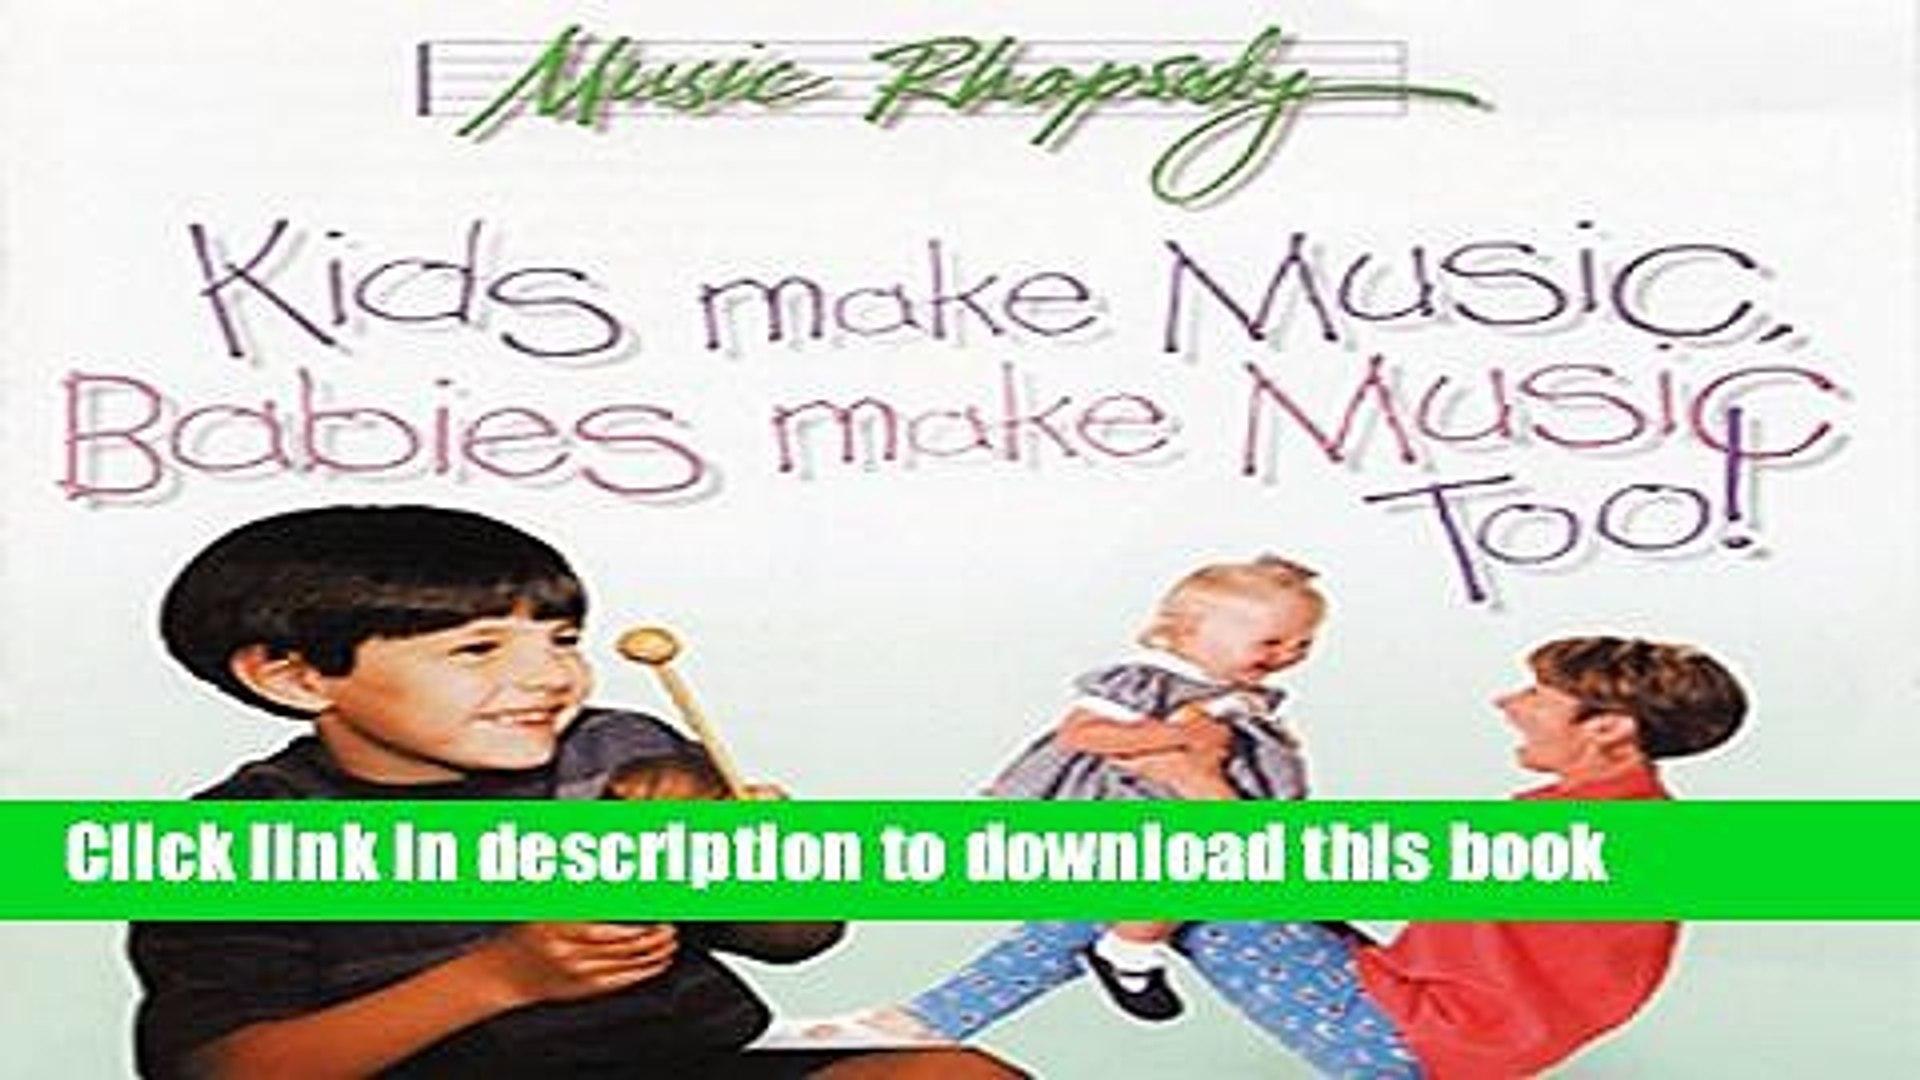 [Read PDF] Kids Make Music, Babies Make Music Too! (Music Rhapsody) Download Online